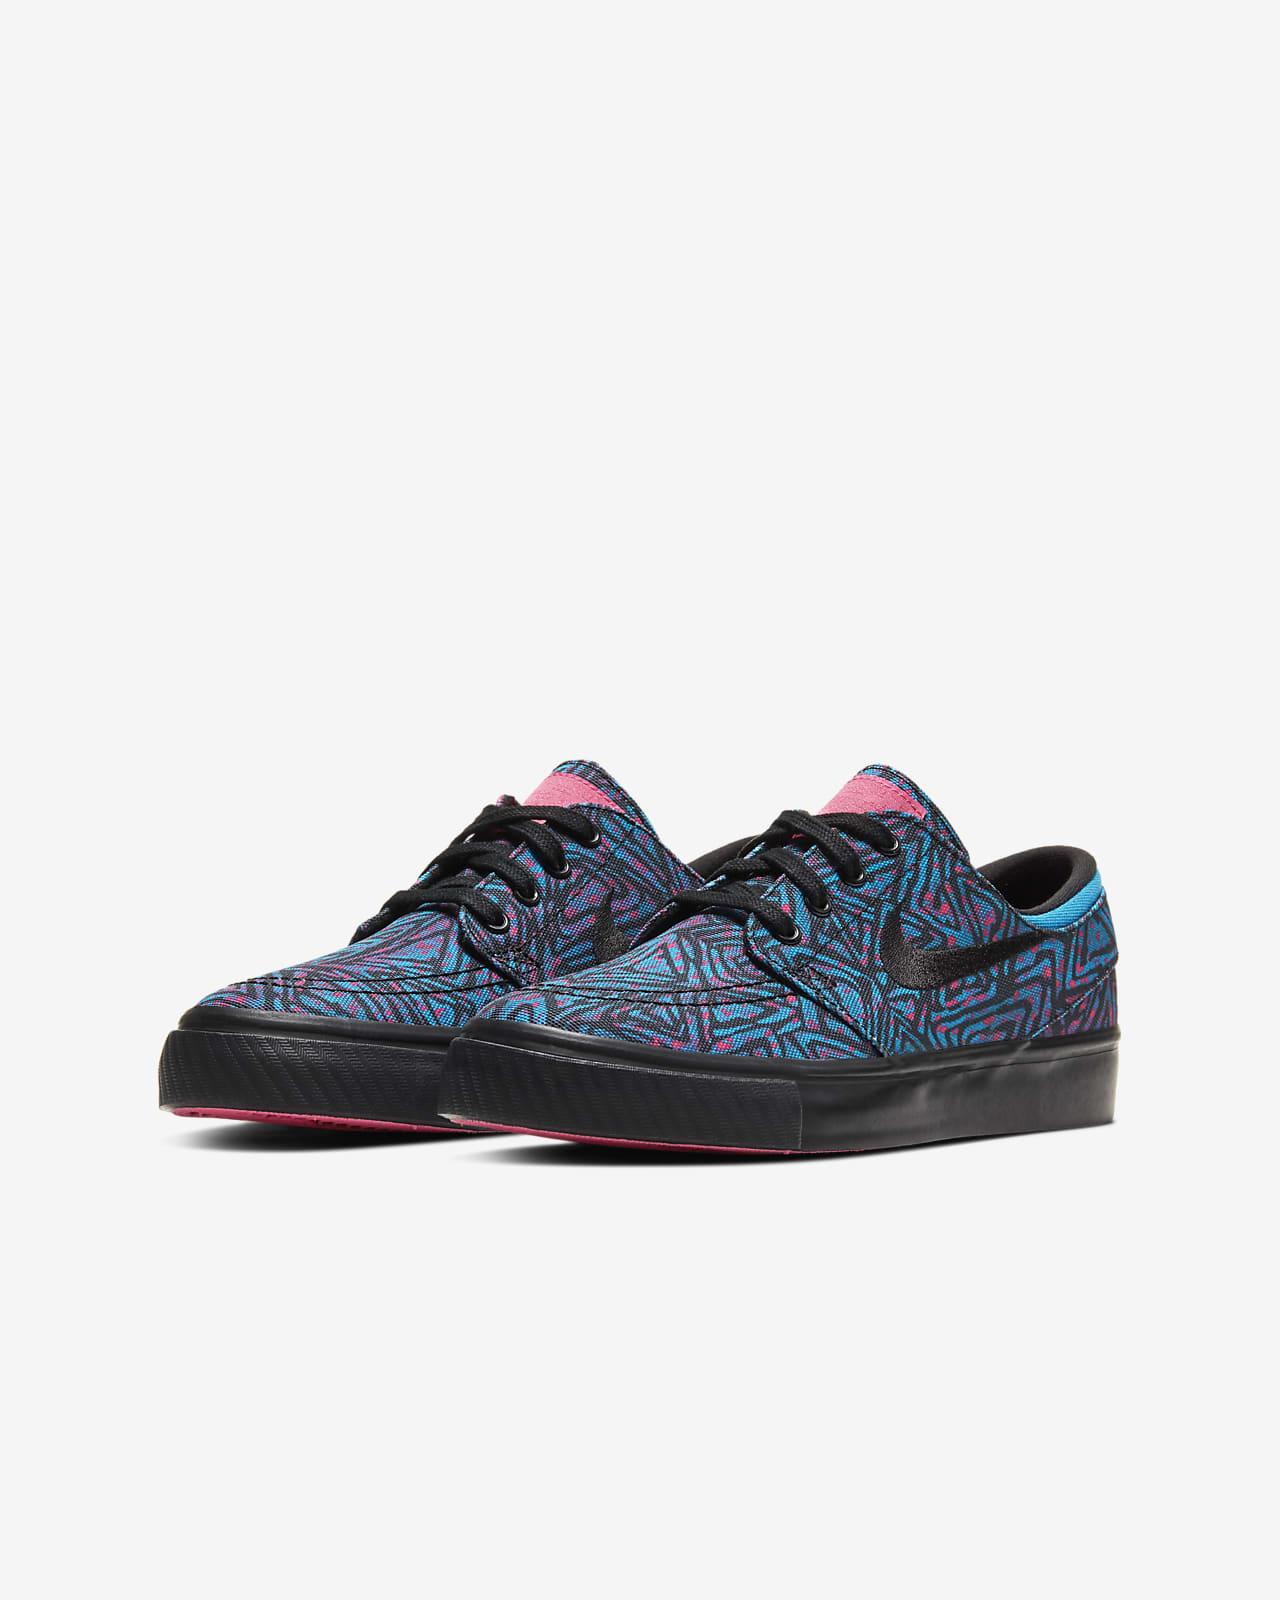 Nike SB Stefan Janoski Canvas Premium Skateboardschuh für jüngere Kinder